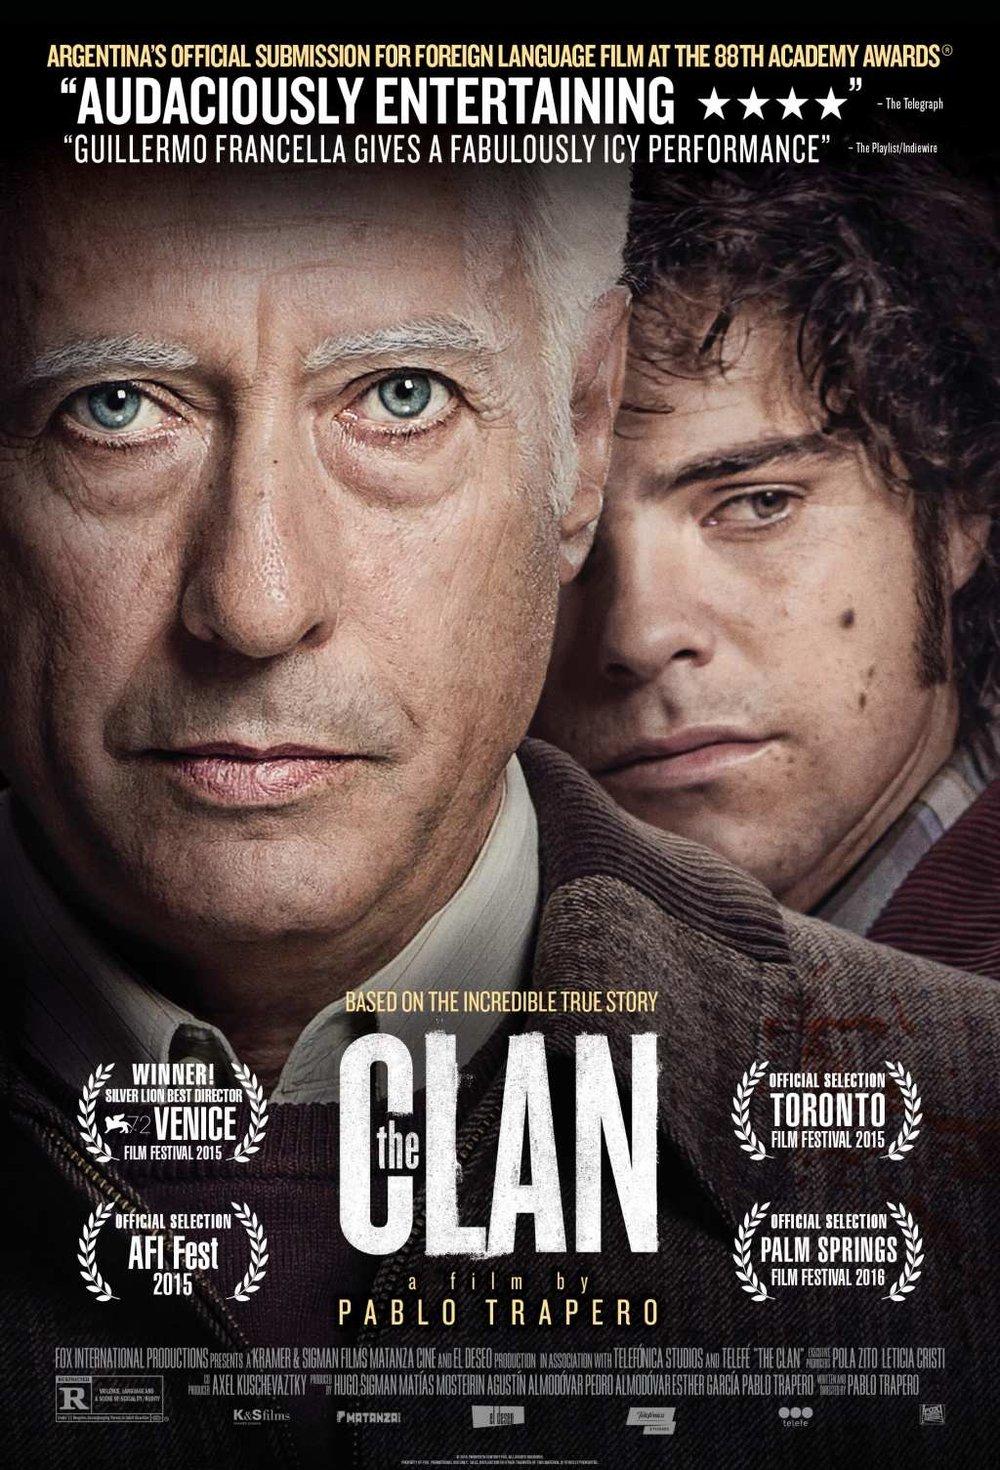 the-clan-cete-izle-2015-full-hd-373.jpg